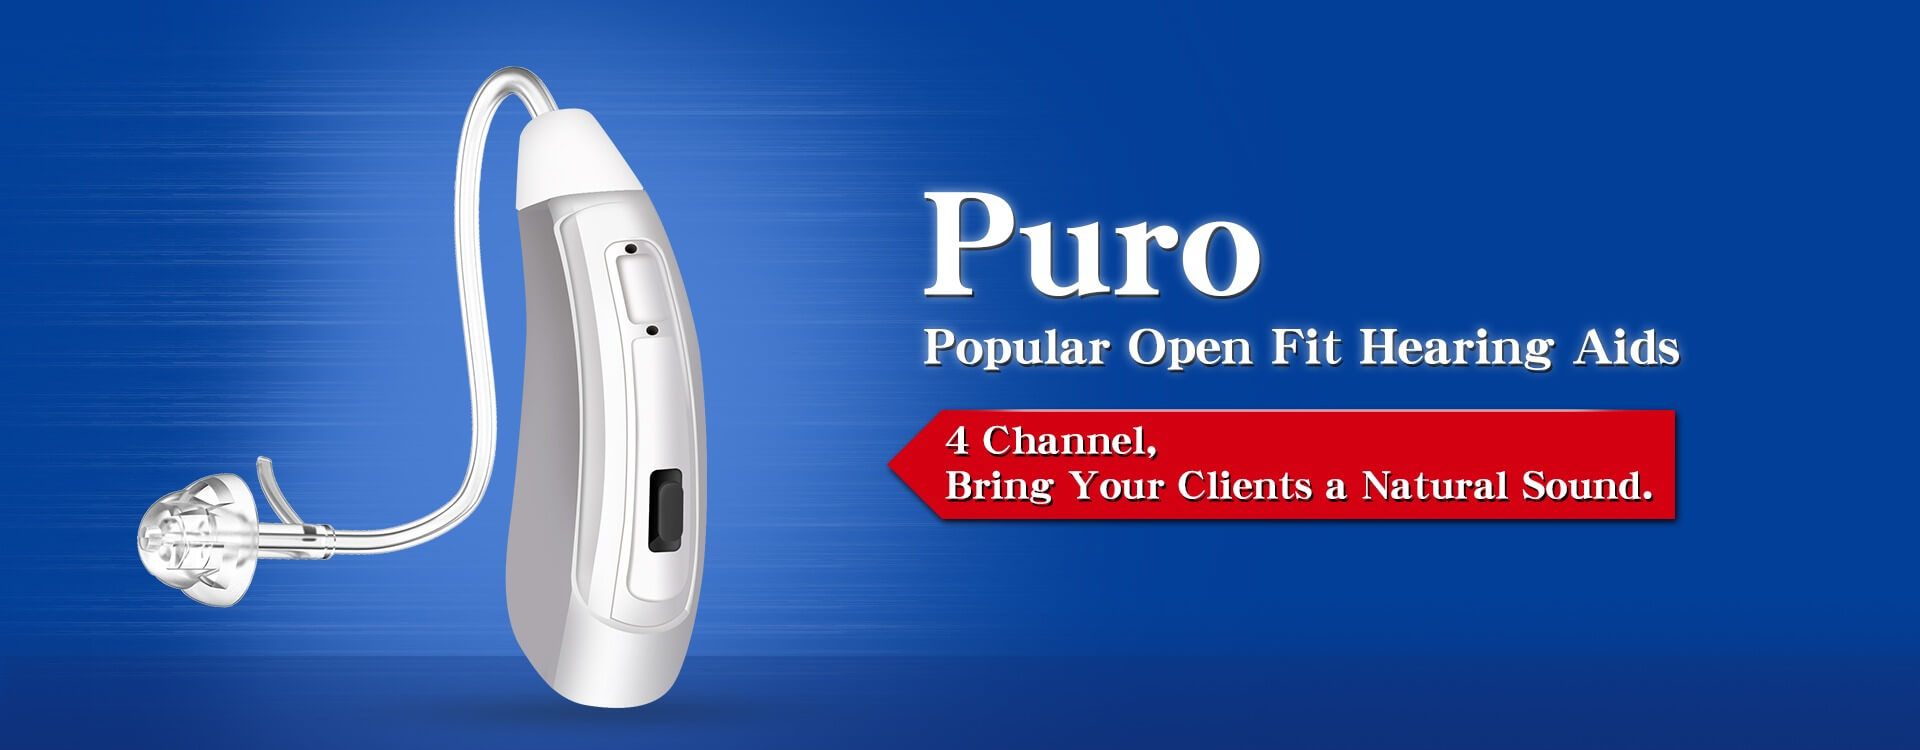 Puro 4 channel digital hearing aids